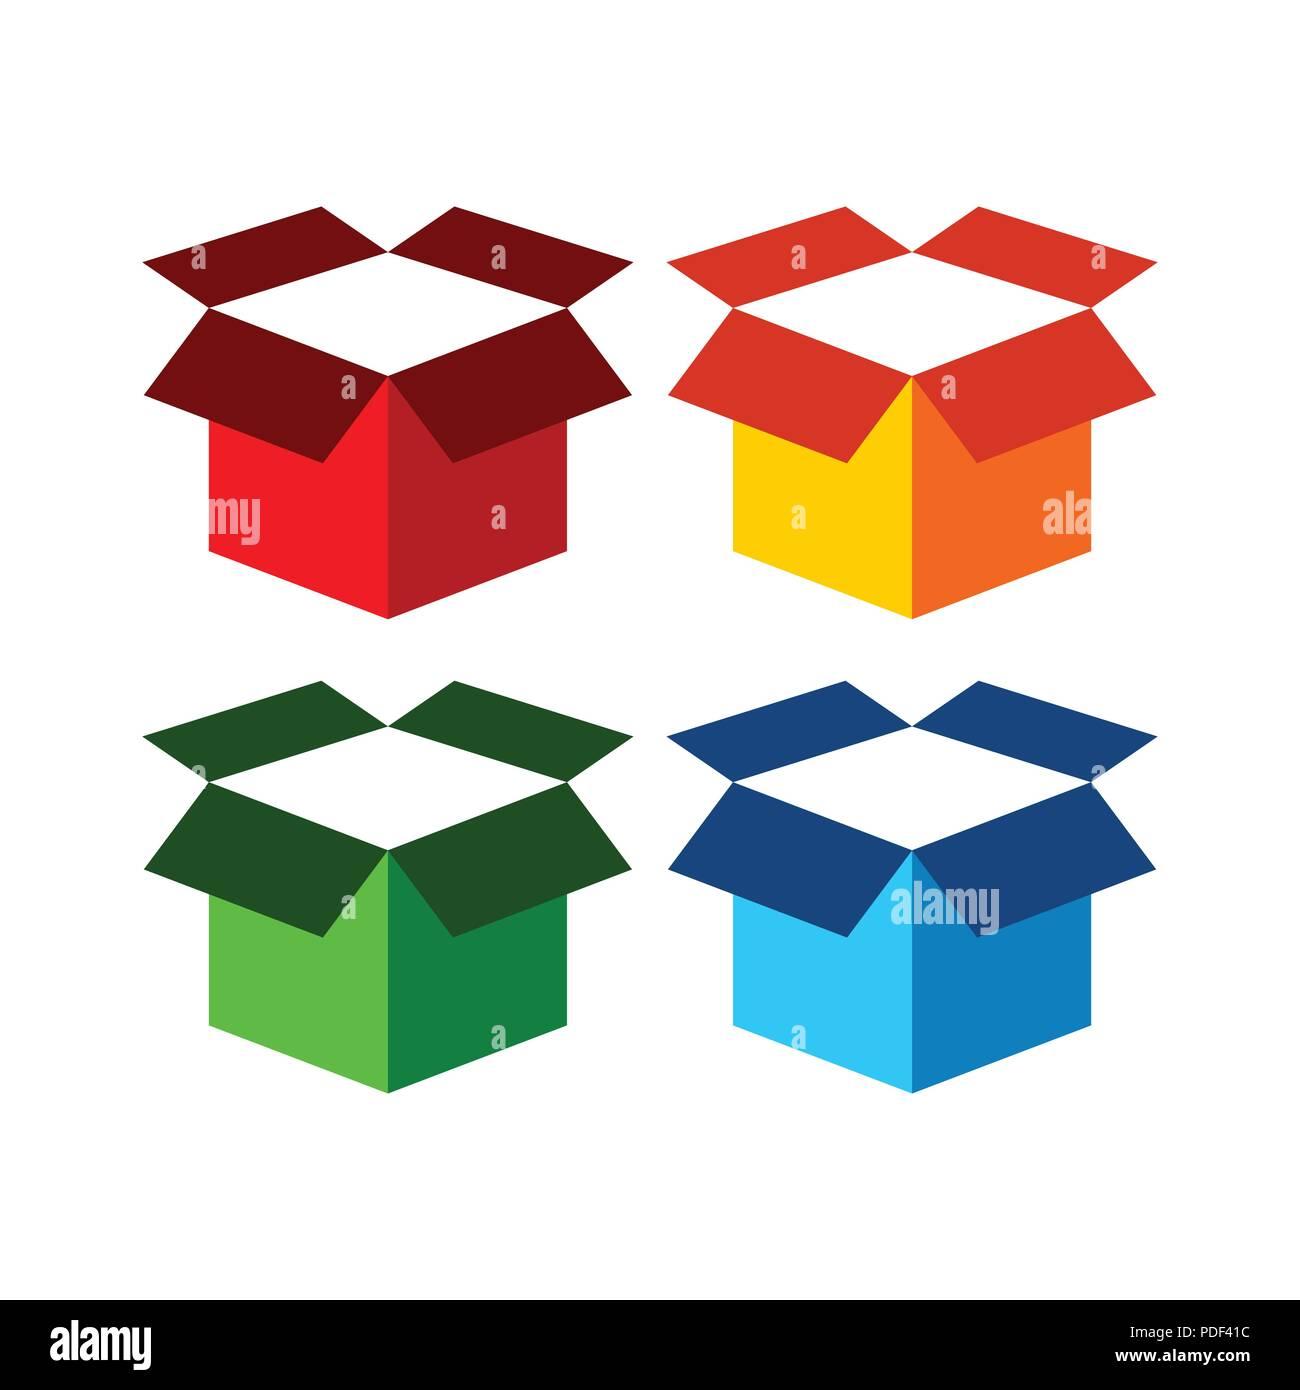 Freight Open Box Vector Icon Symbol Graphic Logo Design Template - Stock Image